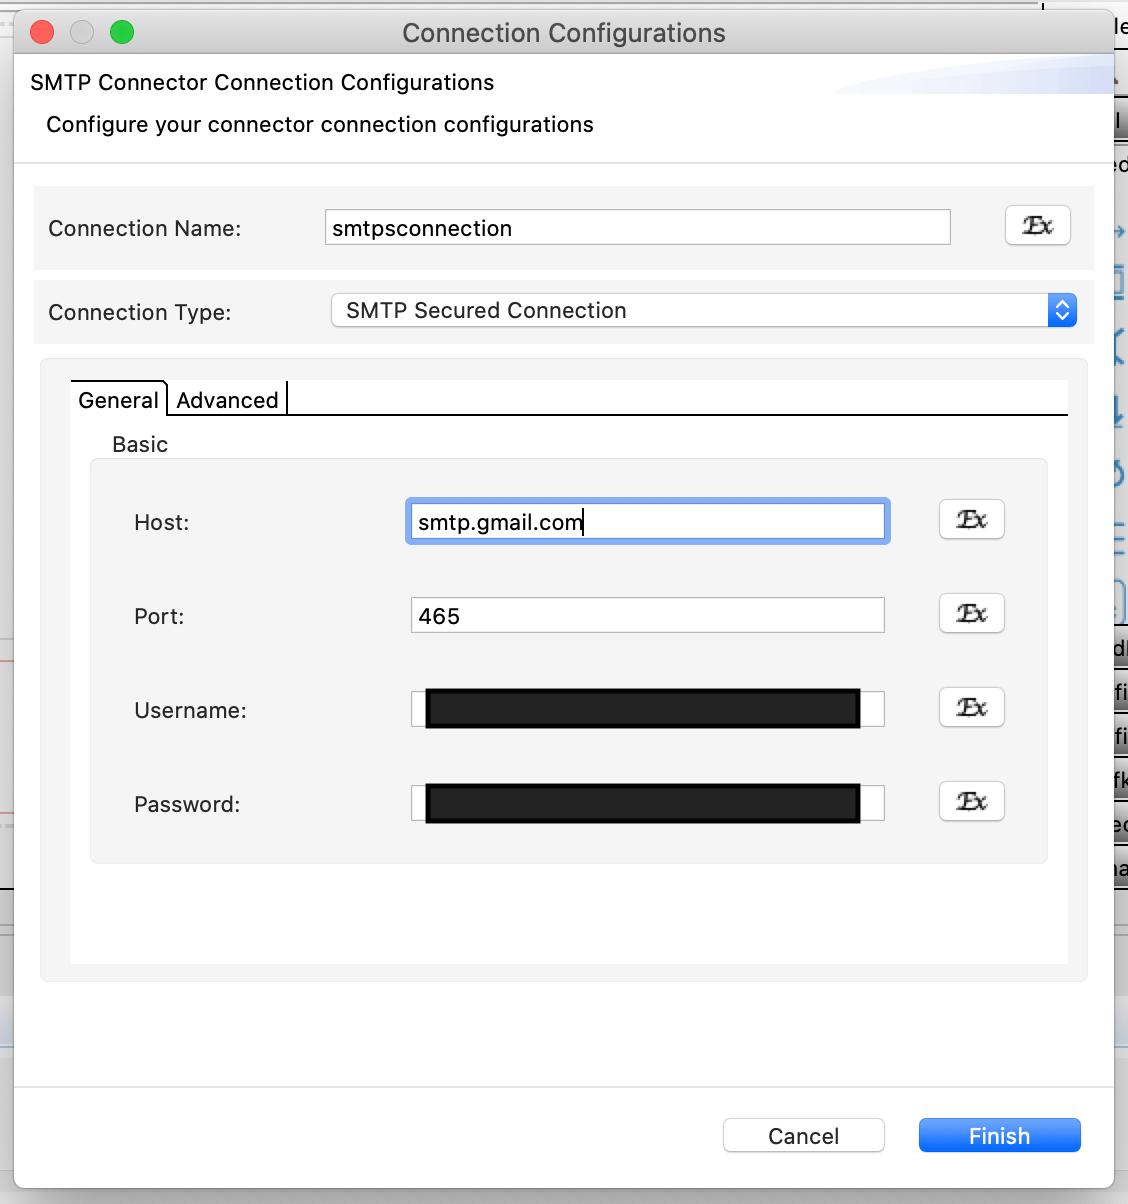 Connection parameters.